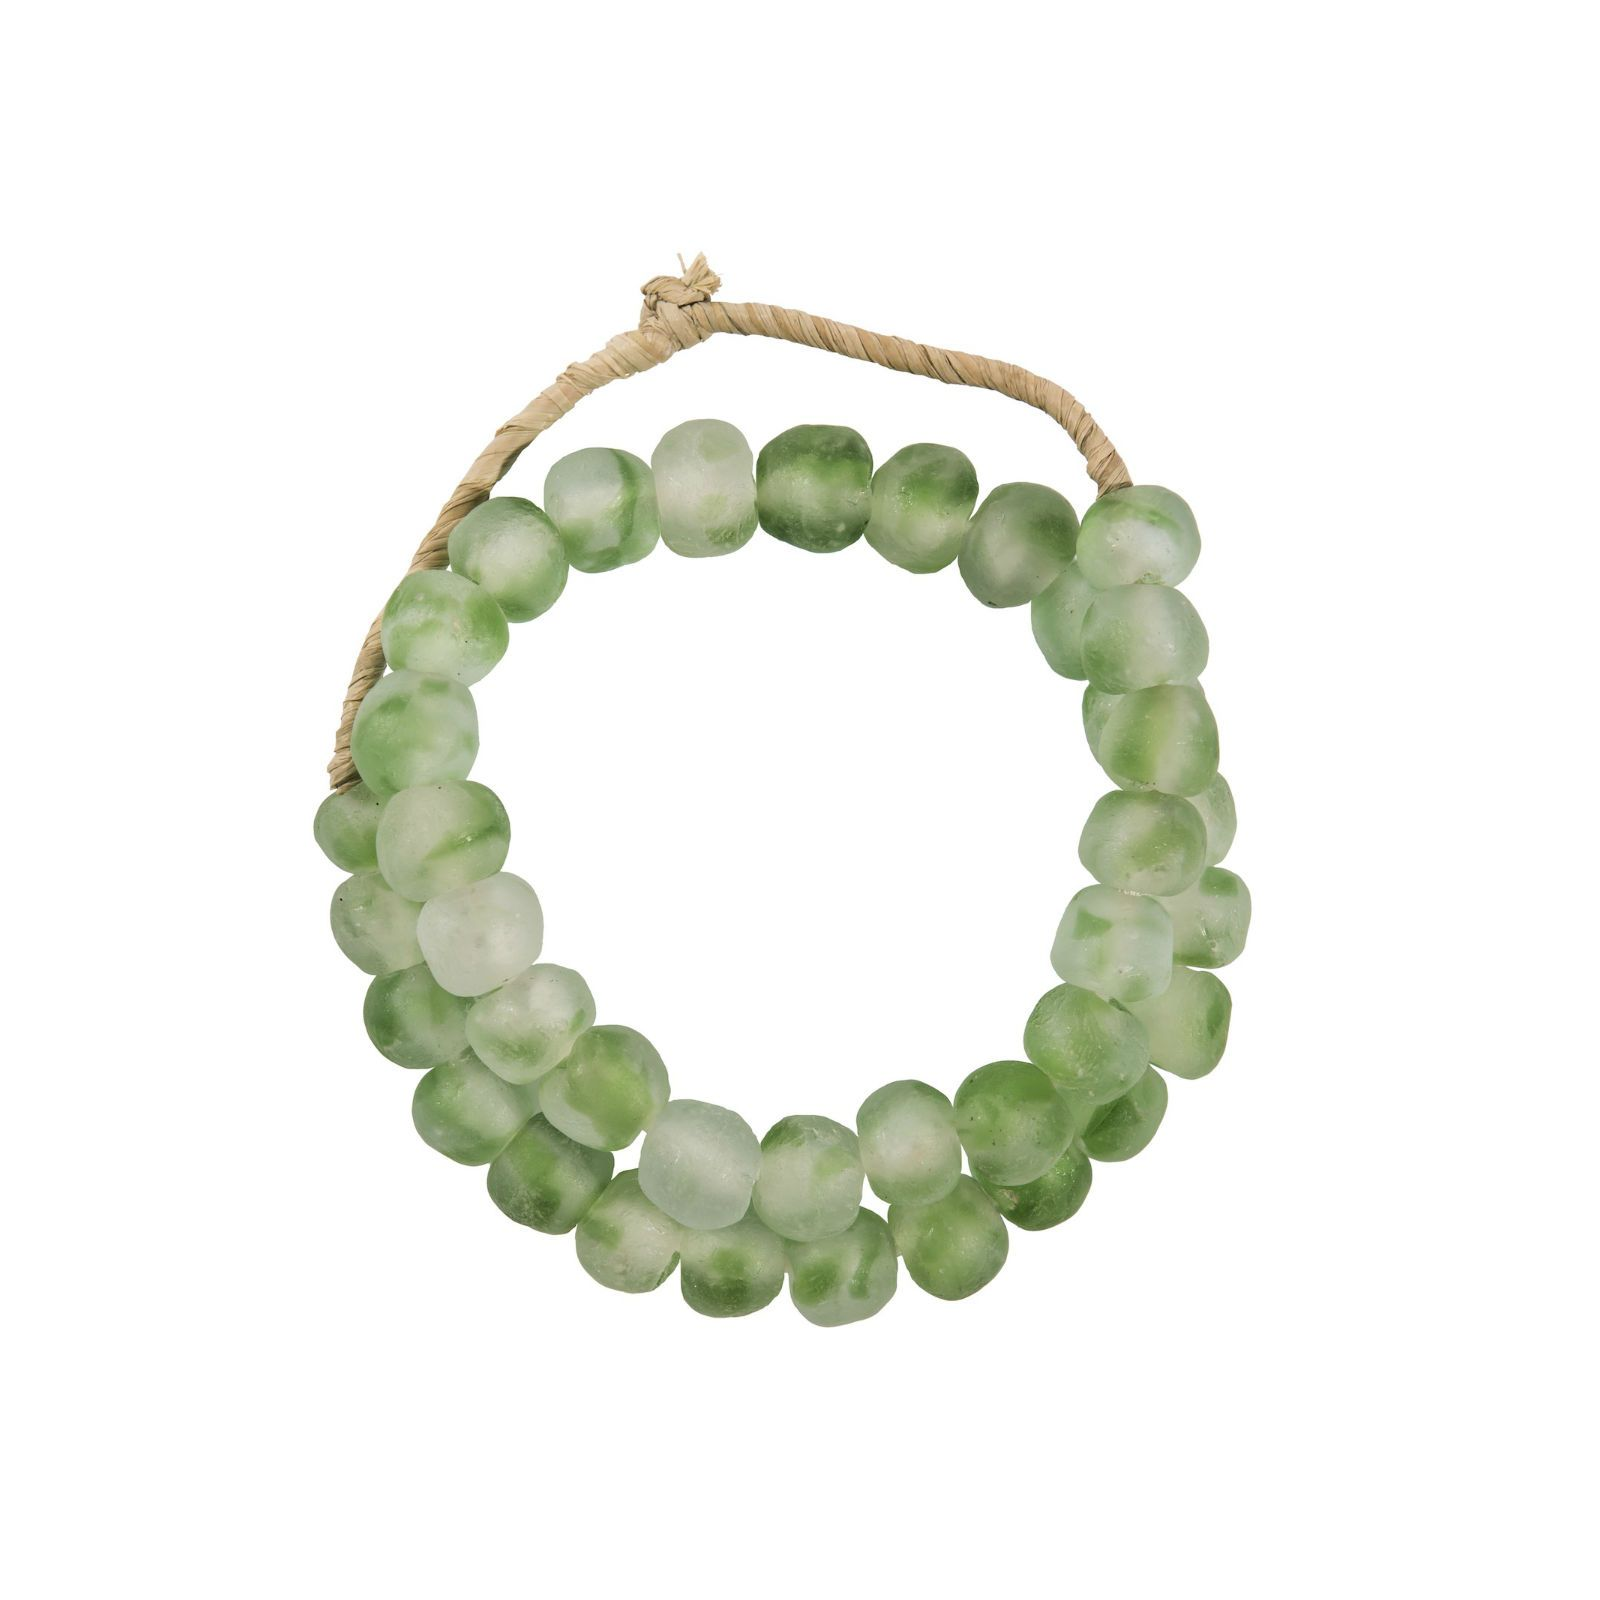 Green_Glass_Beads_1600x1600.jpg